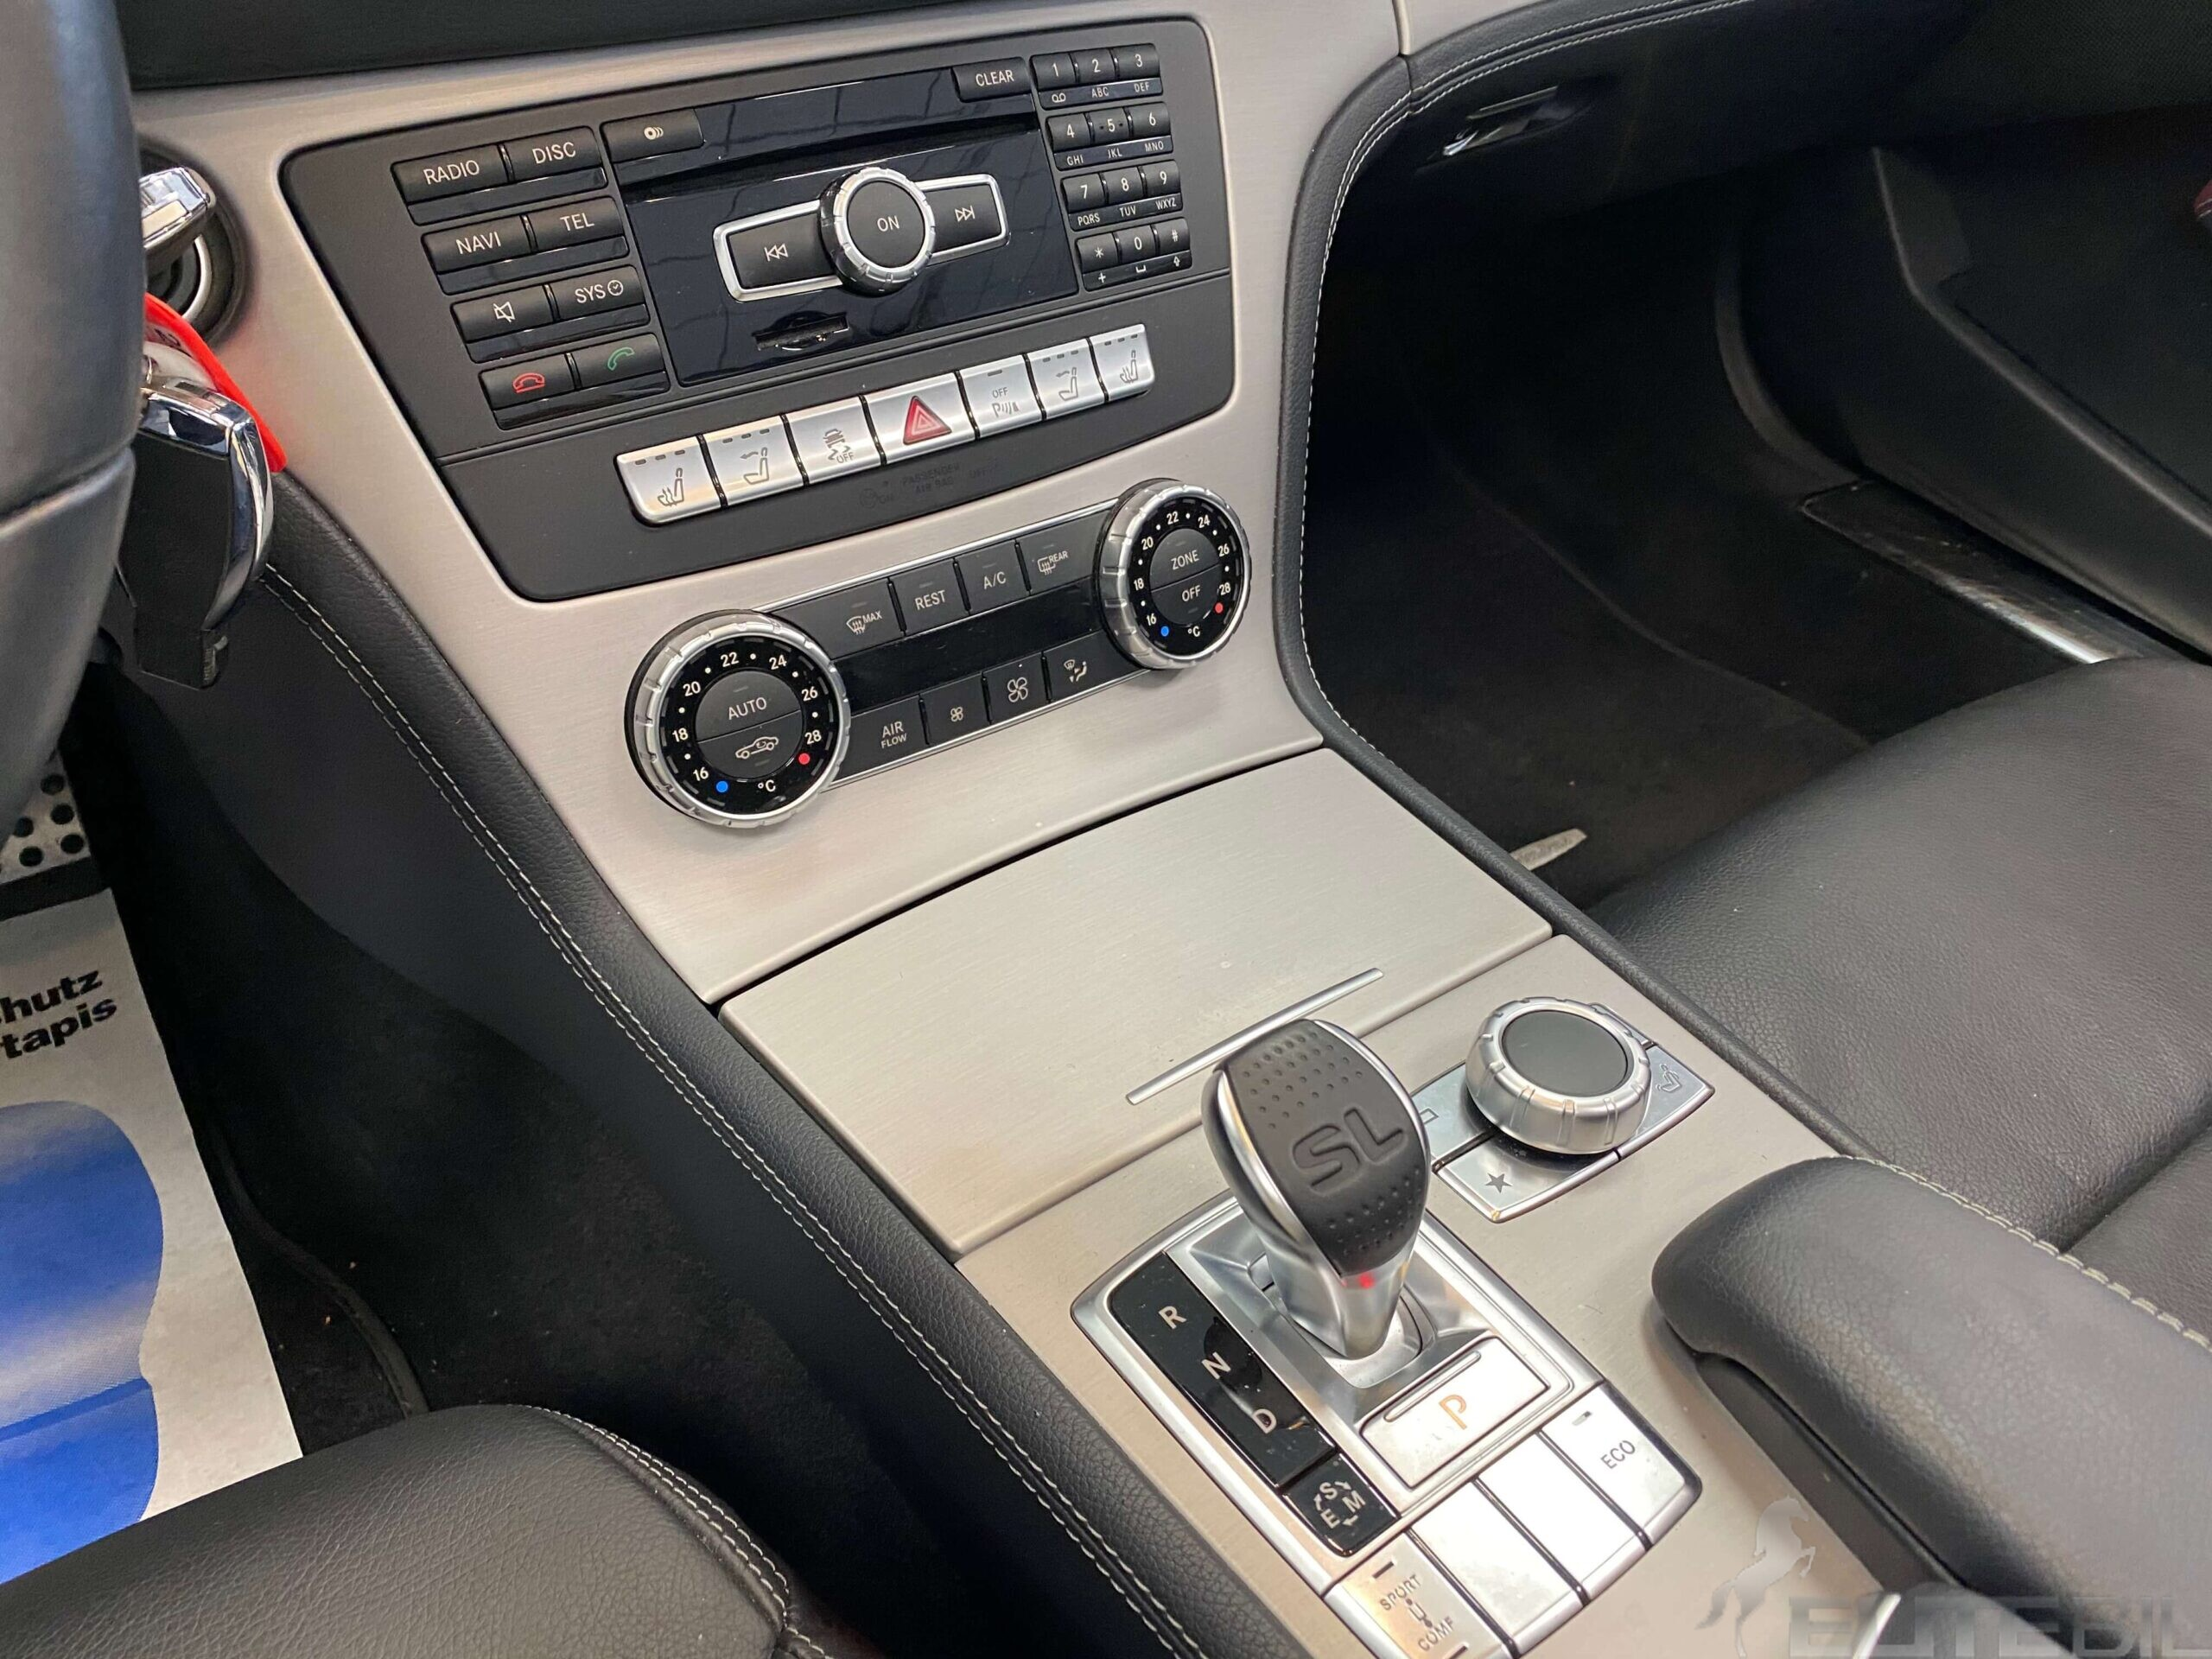 Mercedes-Benz SL 350 7G-Tronic 306hk Bör Ses (14)